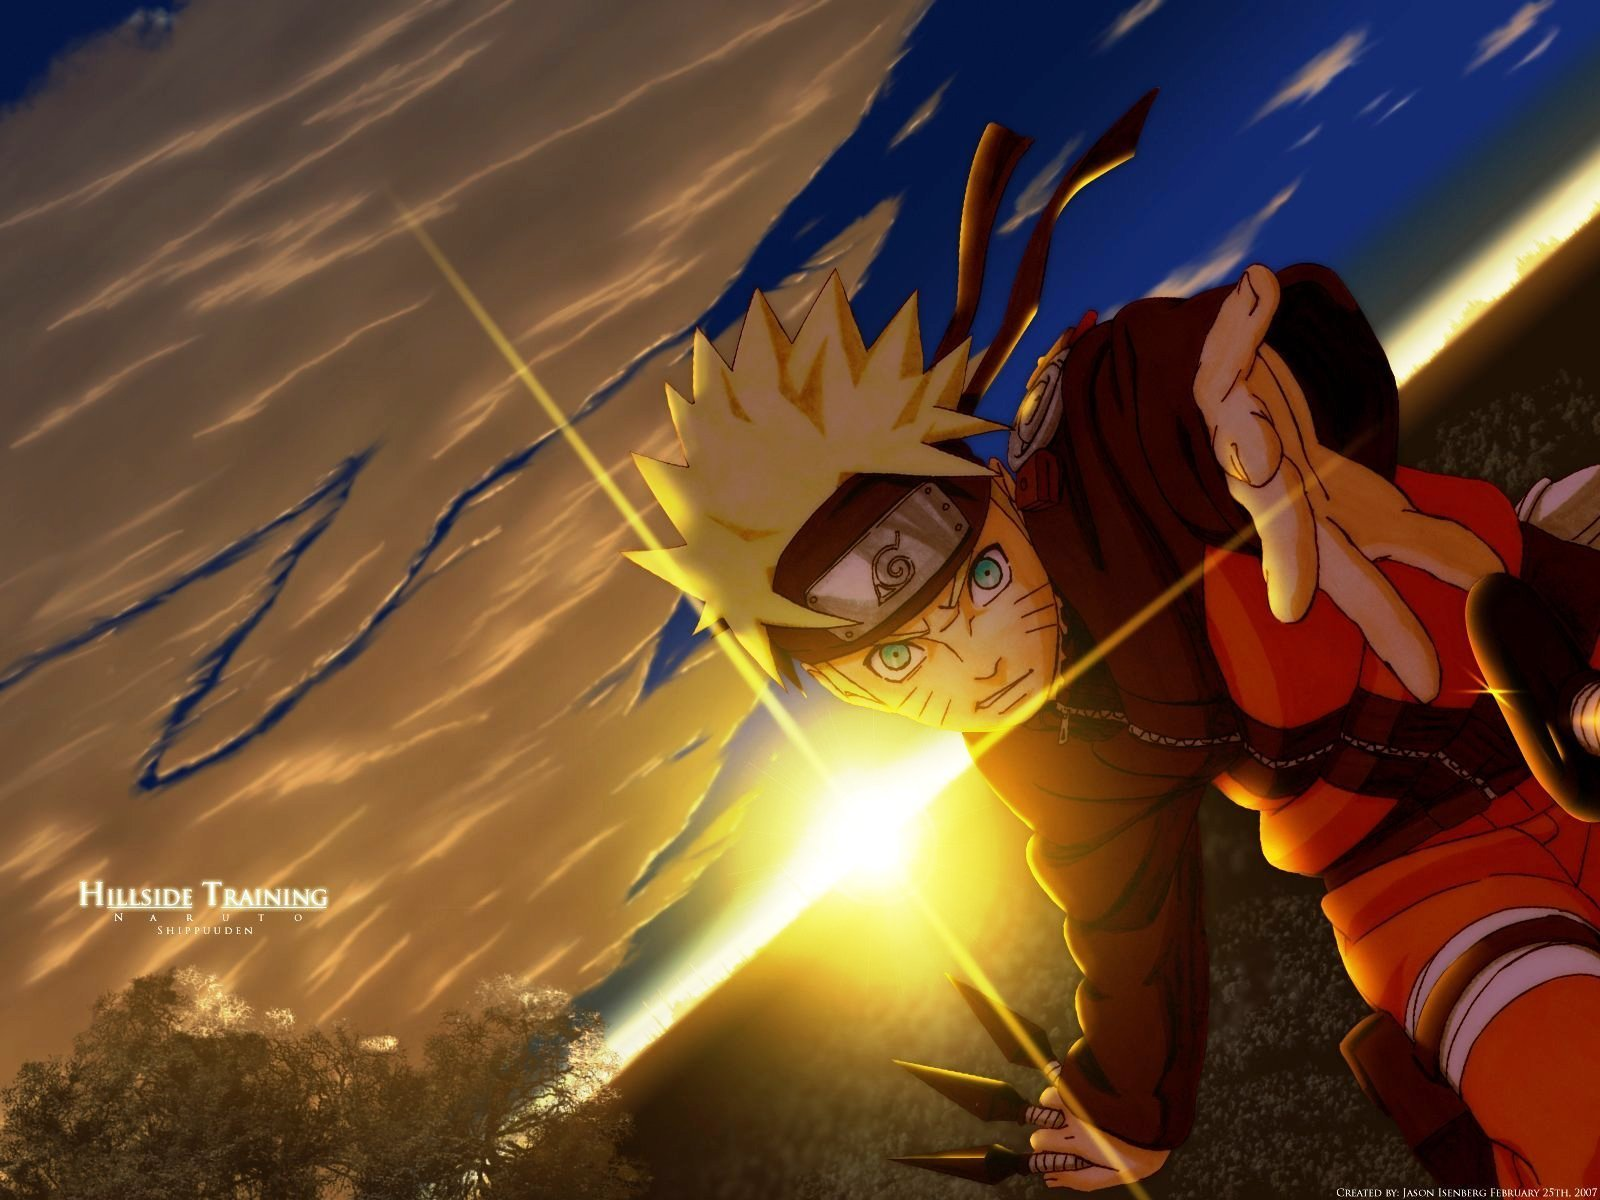 Naruto Vs Sasuke Wallpaper 9558 Hd Wallpapers in Anime   Imagescicom 1600x1200